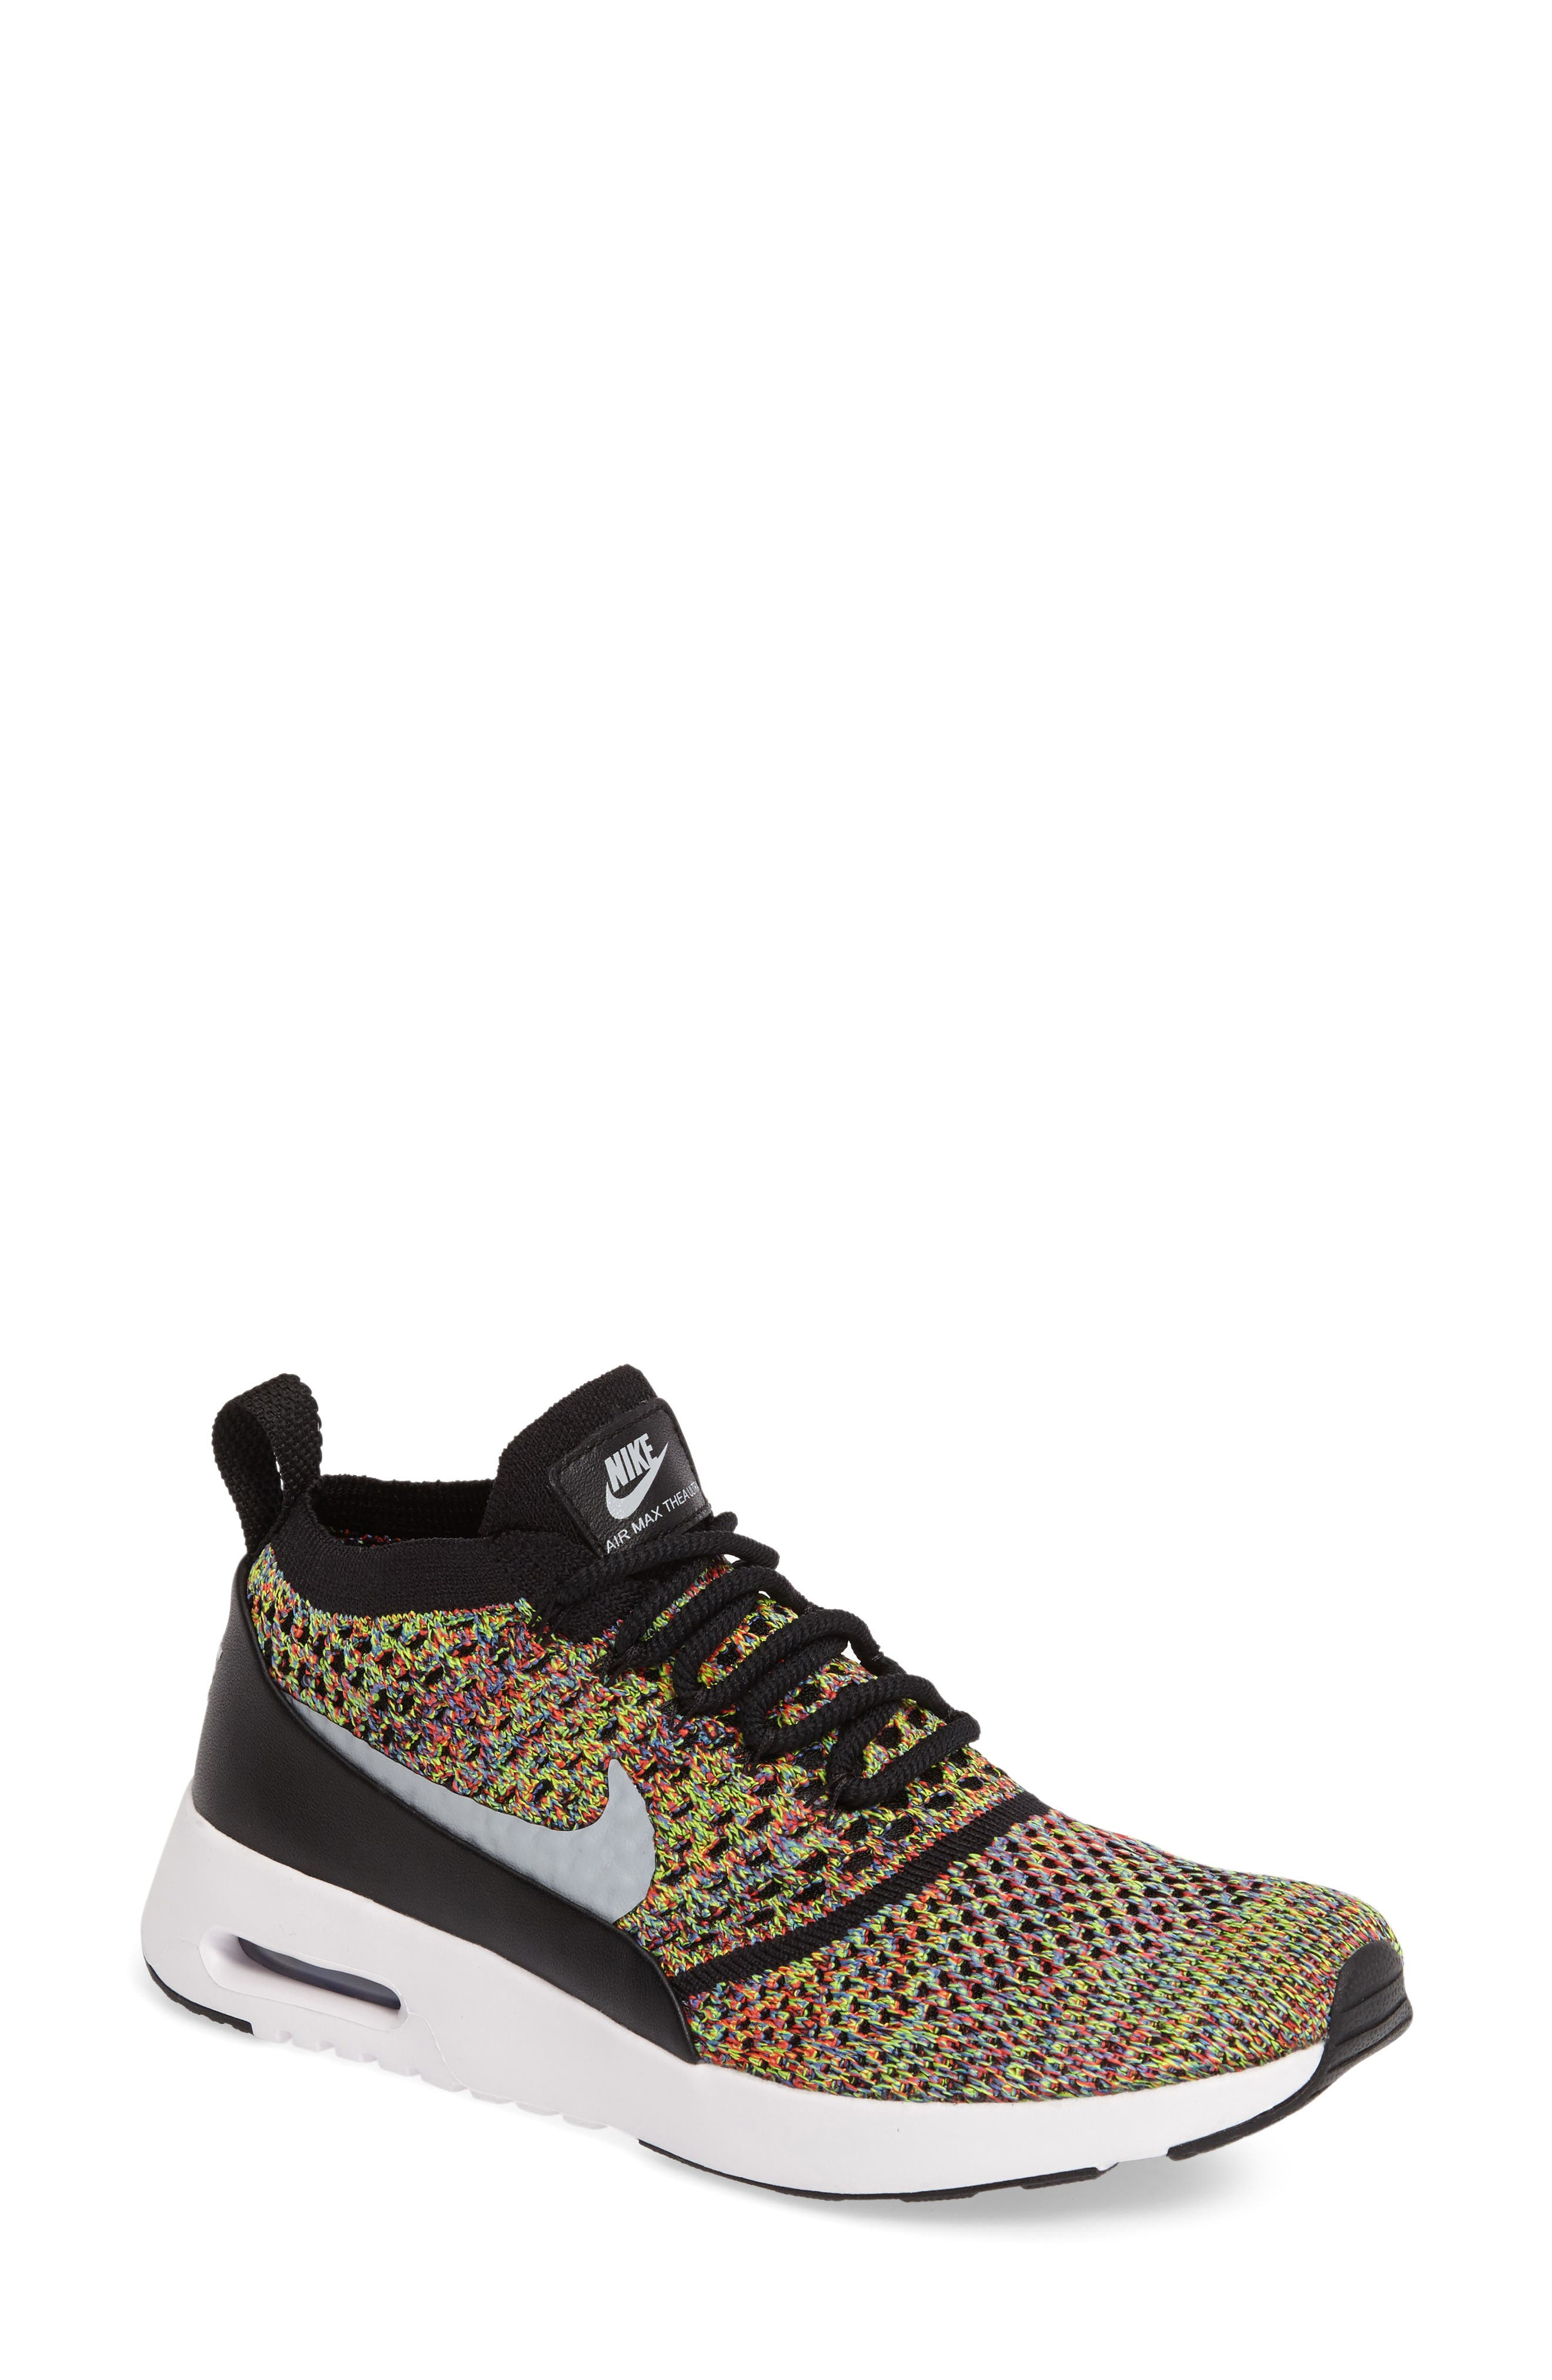 Air Max Thea Ultra Flyknit Sneaker,                             Main thumbnail 4, color,